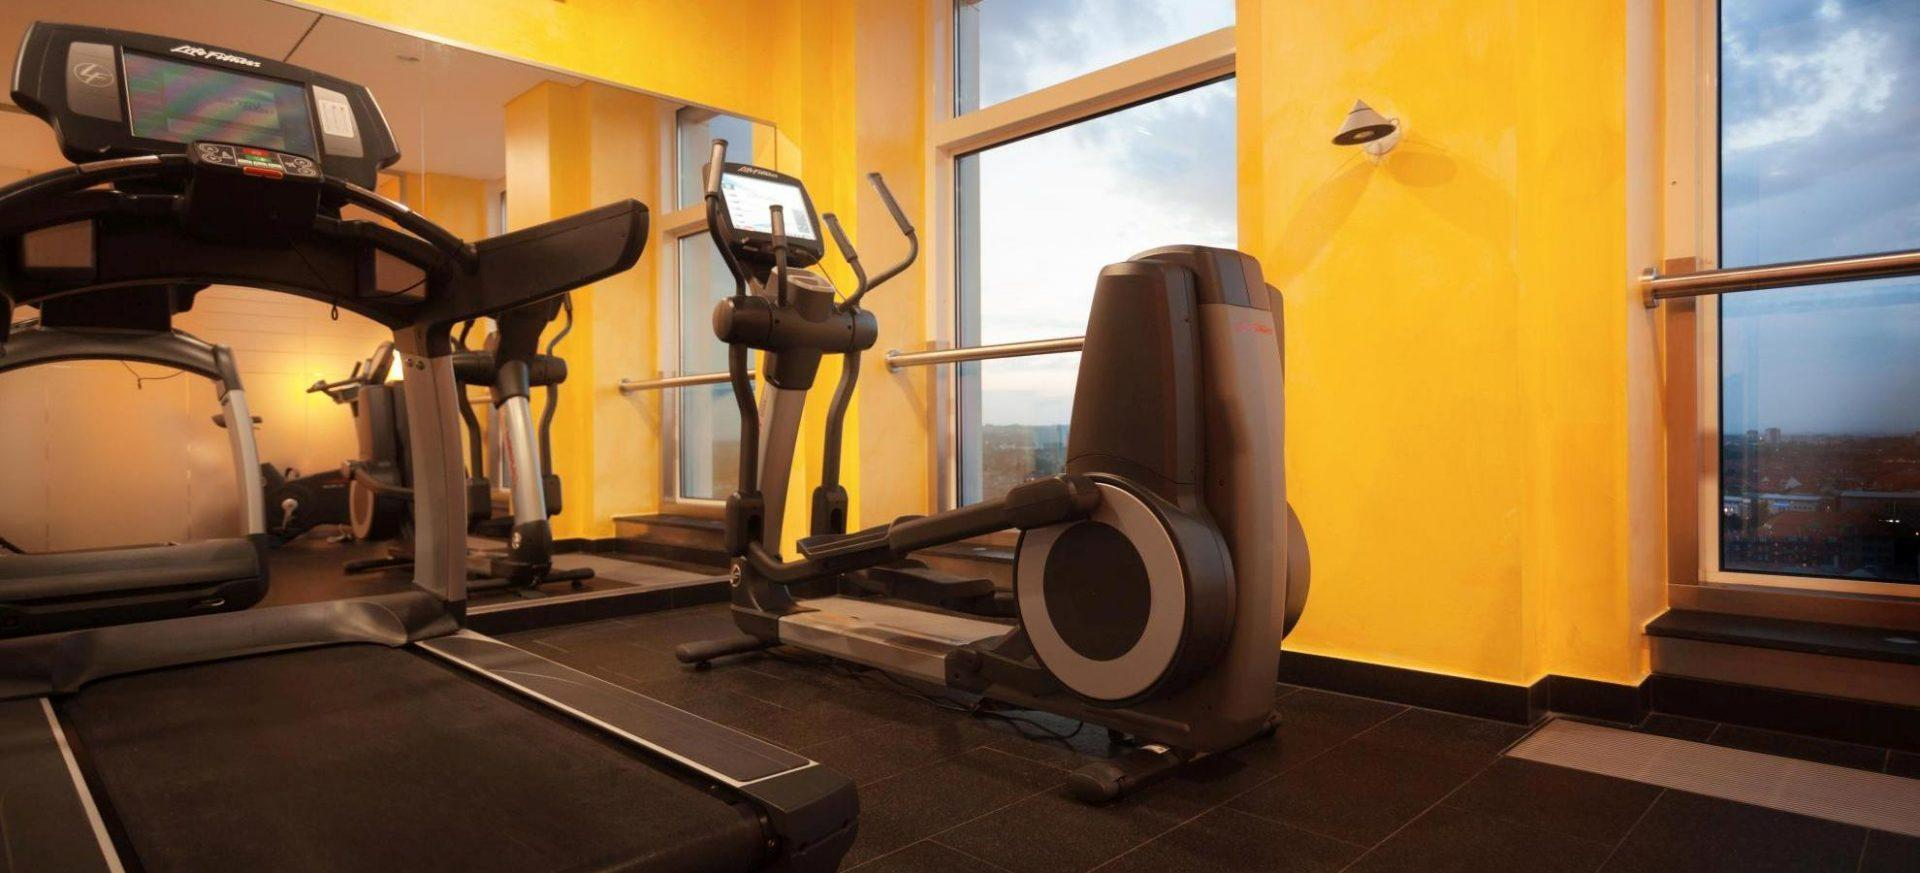 Radisson Blu Hotel Erfurt Fitness